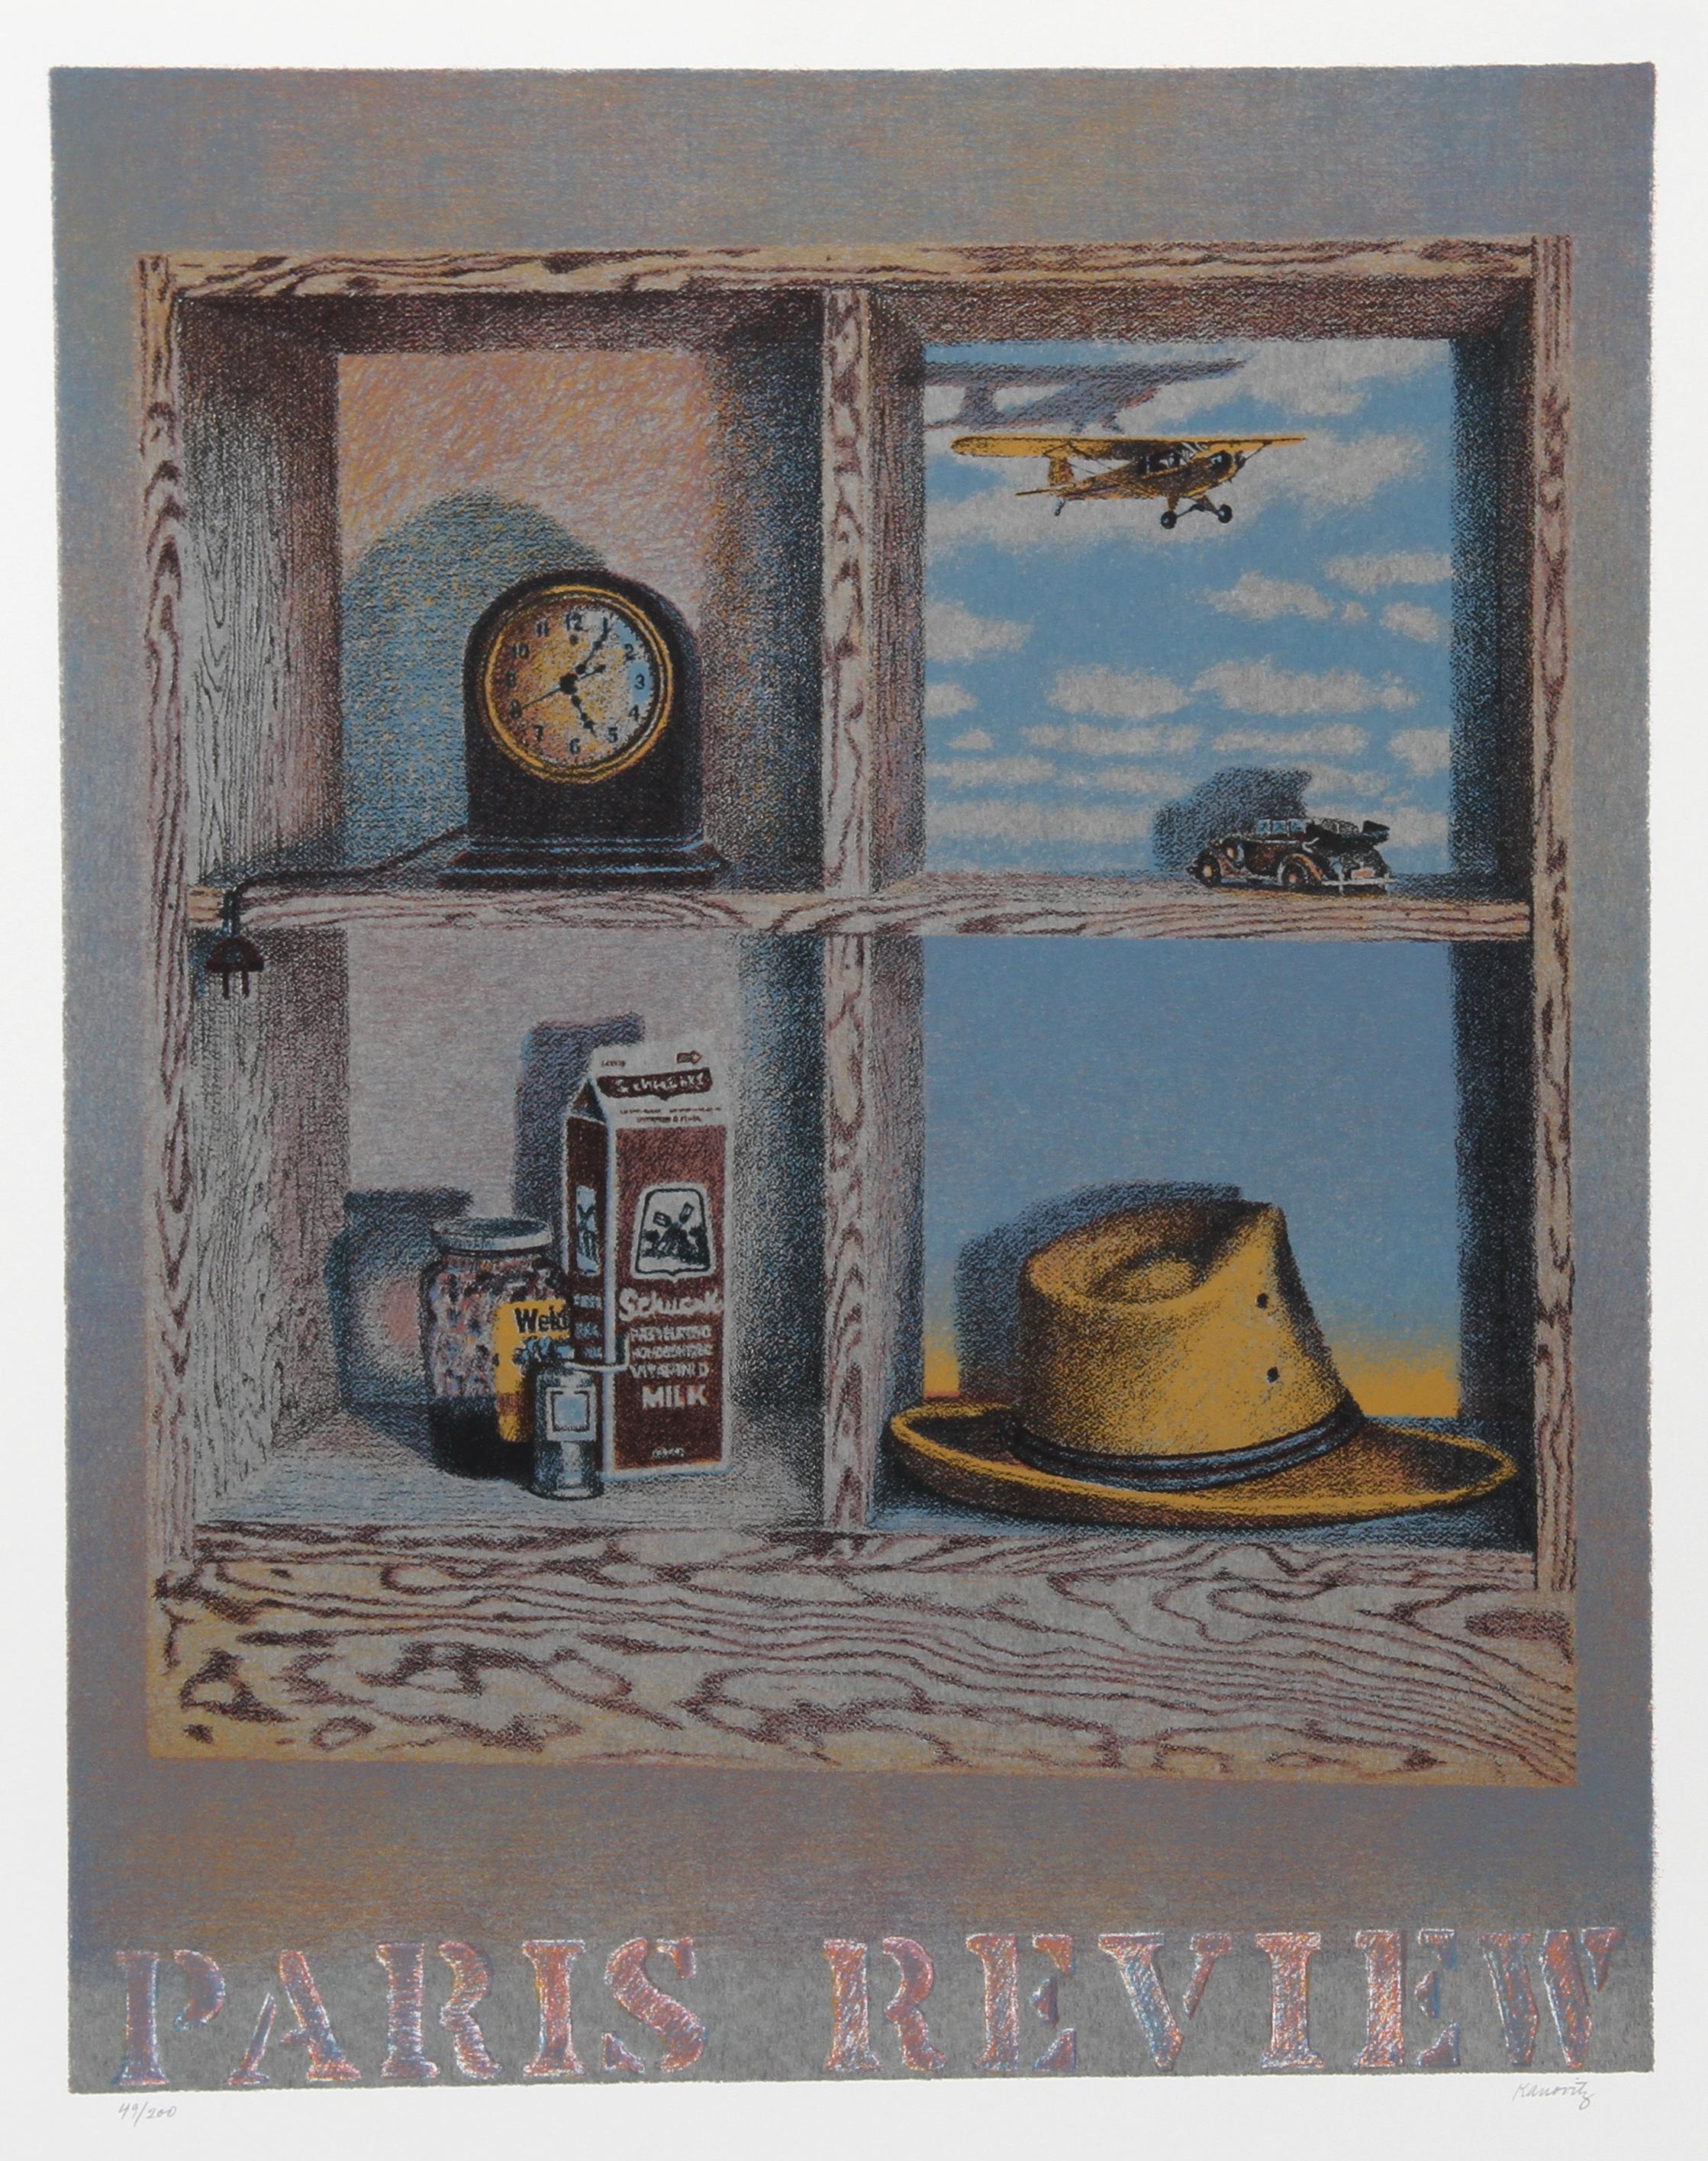 """Paris Review"", Lithograph by Howard Kanovitz"